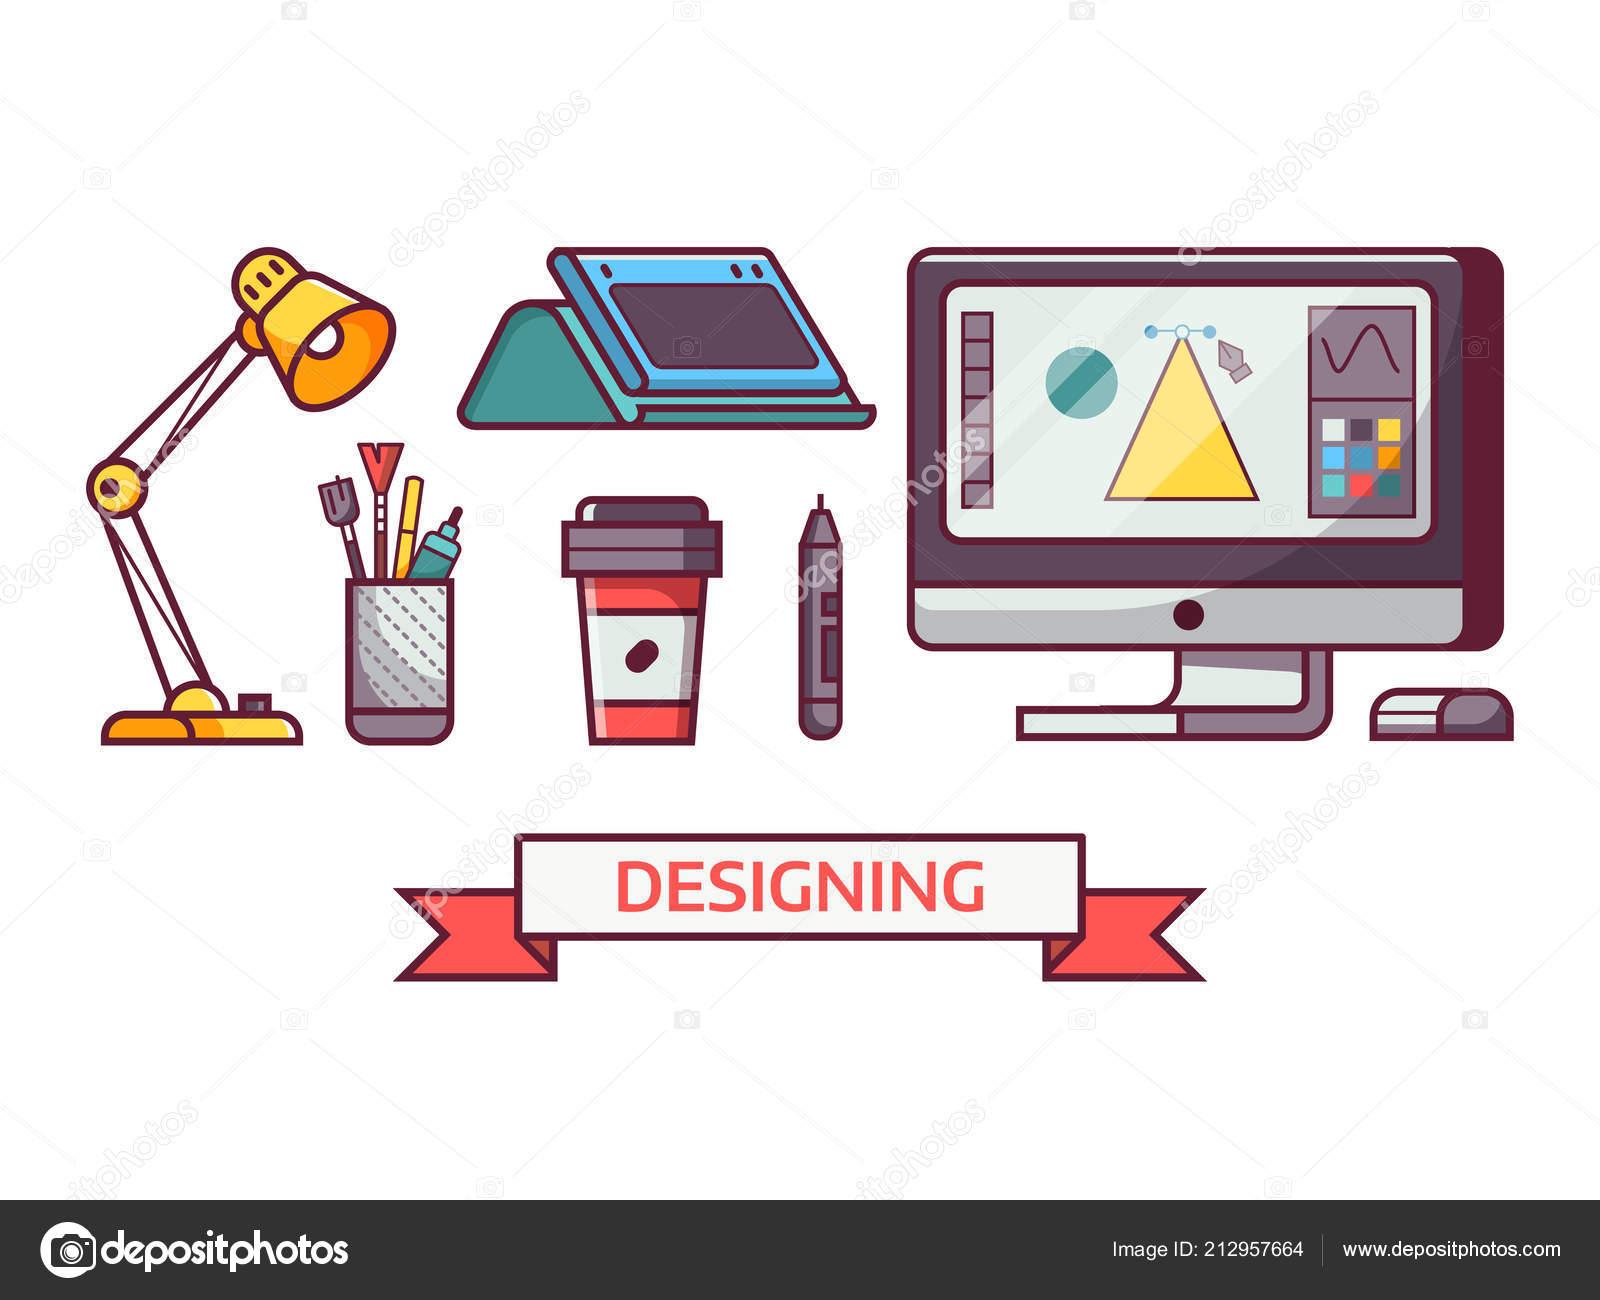 Digital Designer or Illustrator Icons — Stock Vector